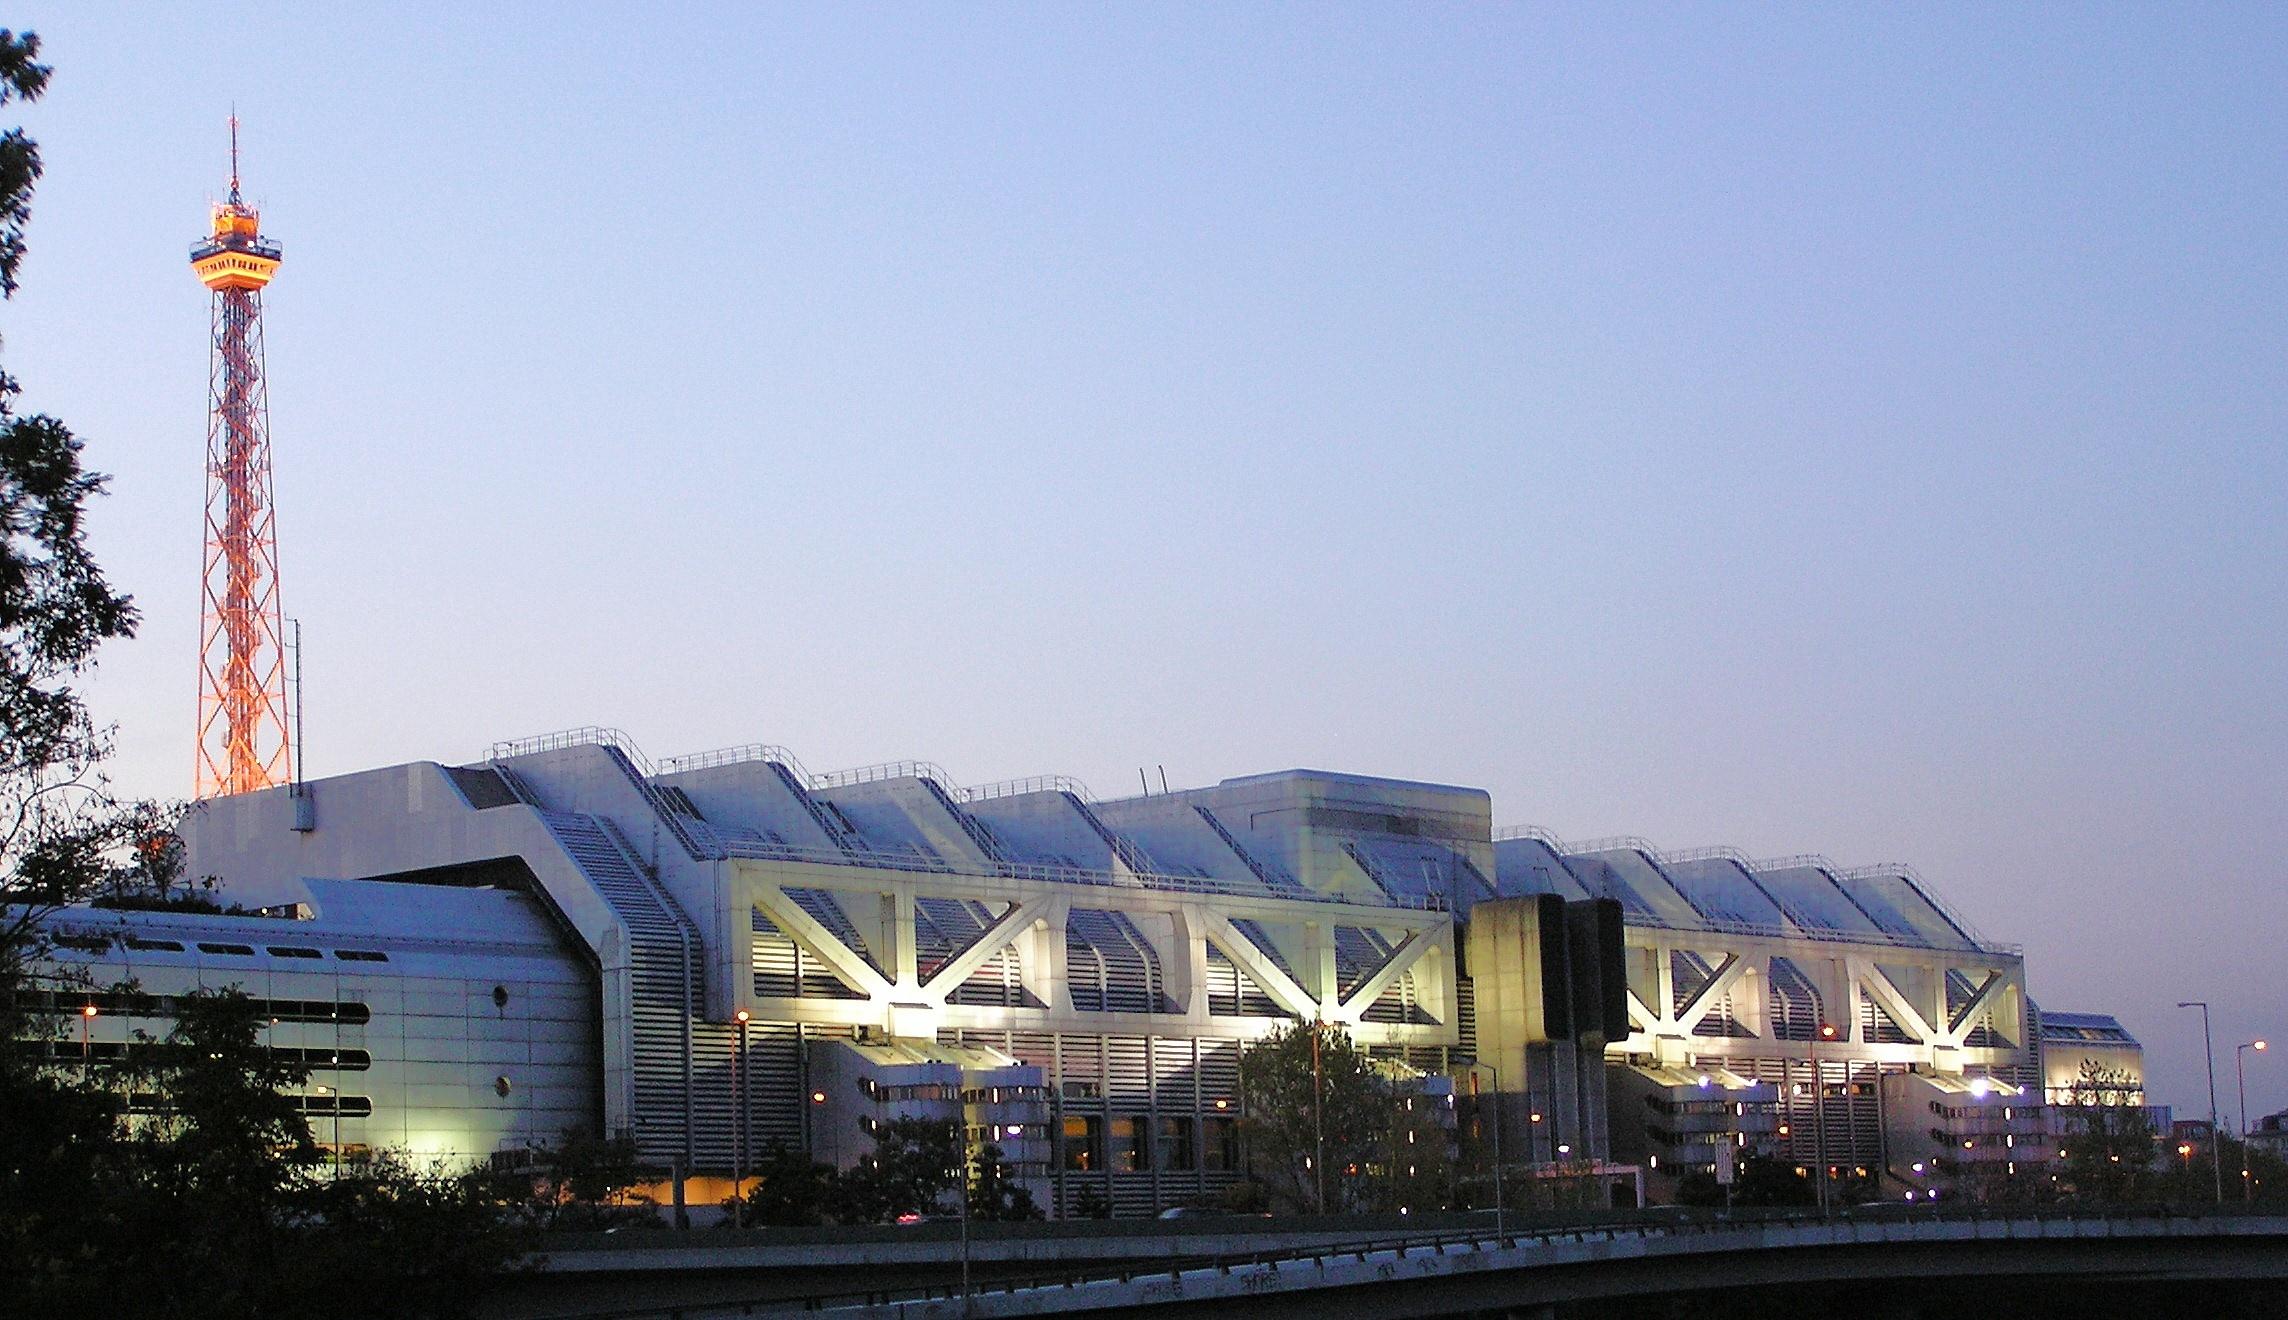 Internationales Congress Centrum Berlin